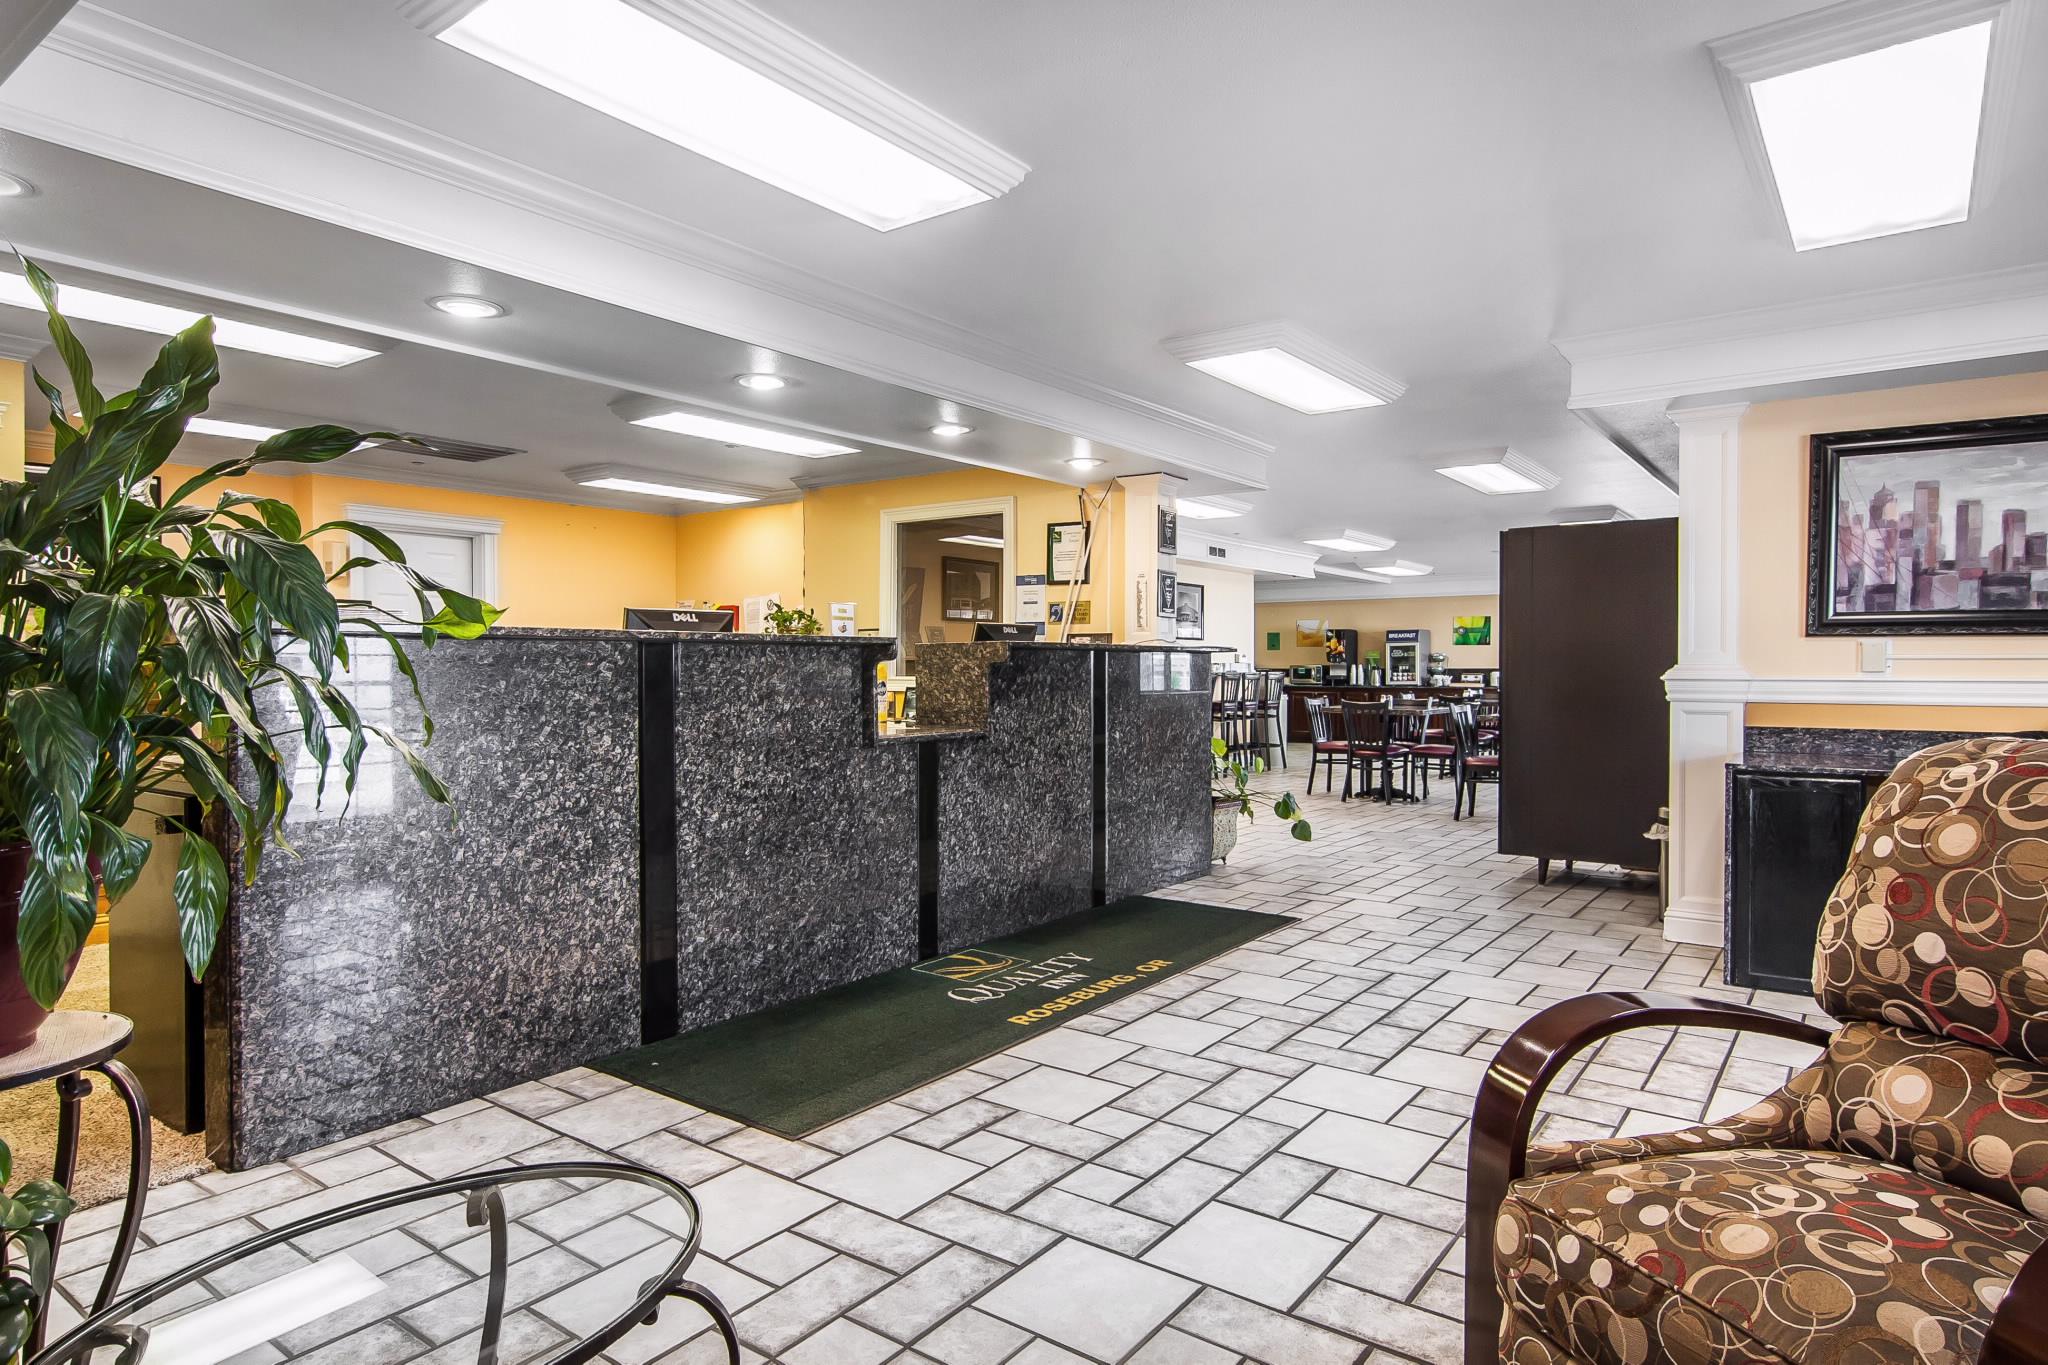 Quality Inn Central At 427 Nw Garden Valley Blvd